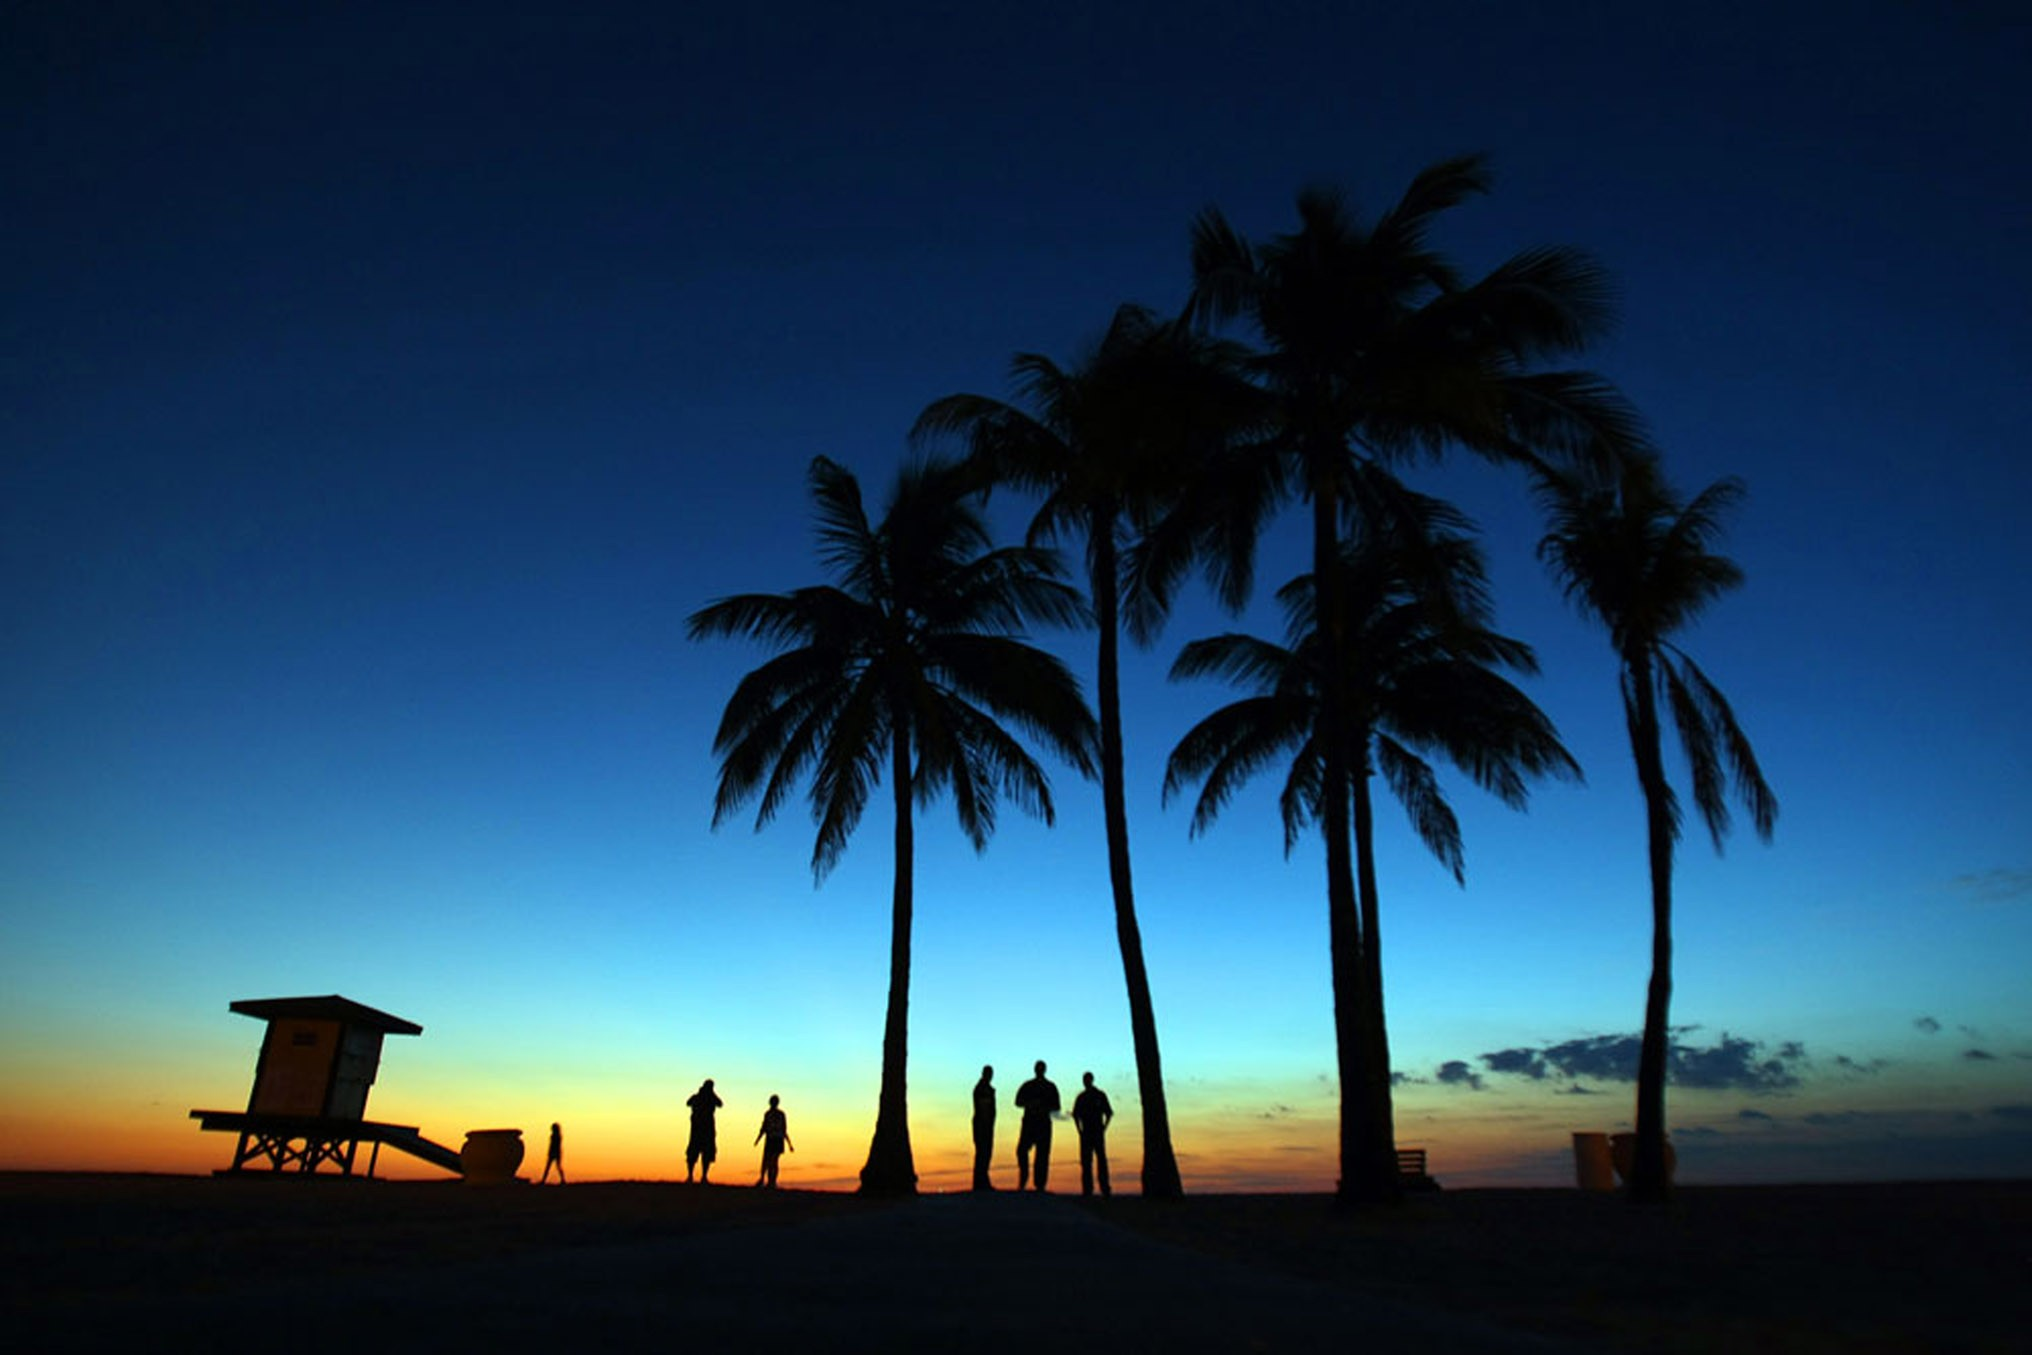 Sunrise & Sunset: Beach Palm Trees | Sun Sentinel Store